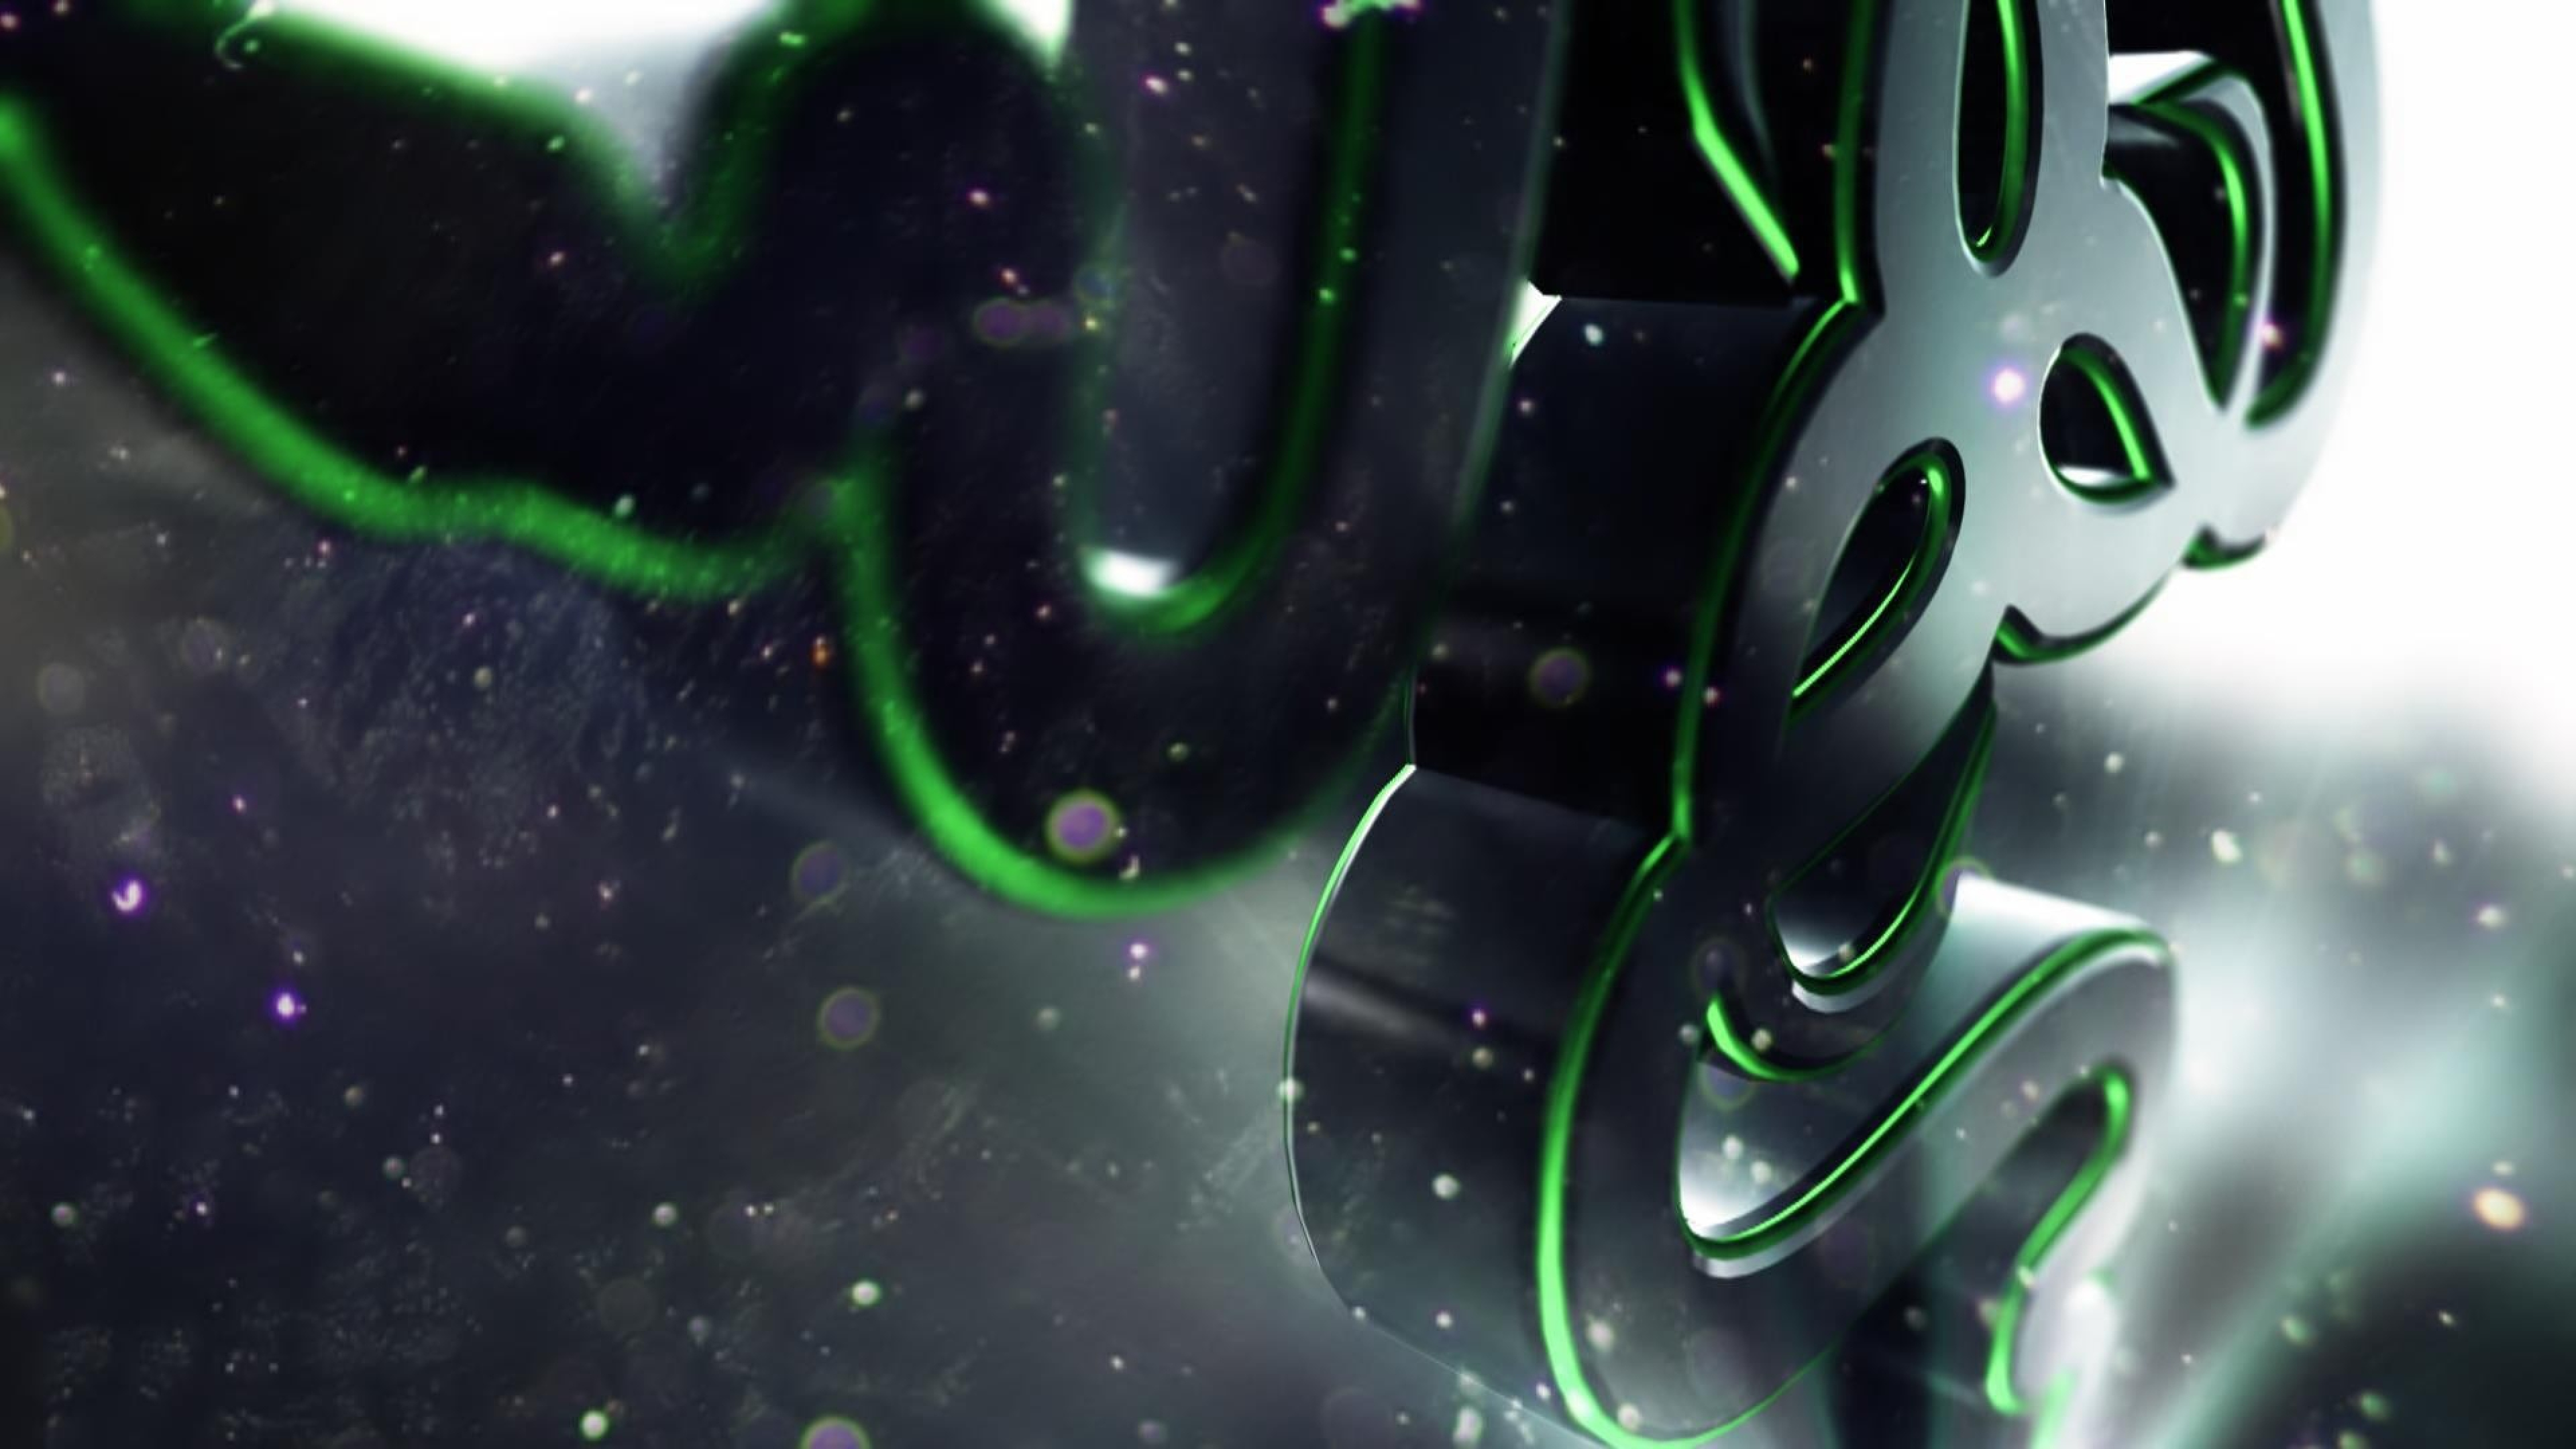 Download Wallpaper 3840x2160 Razer Logo Symbol Shape 4K Ultra HD HD 3840x2160